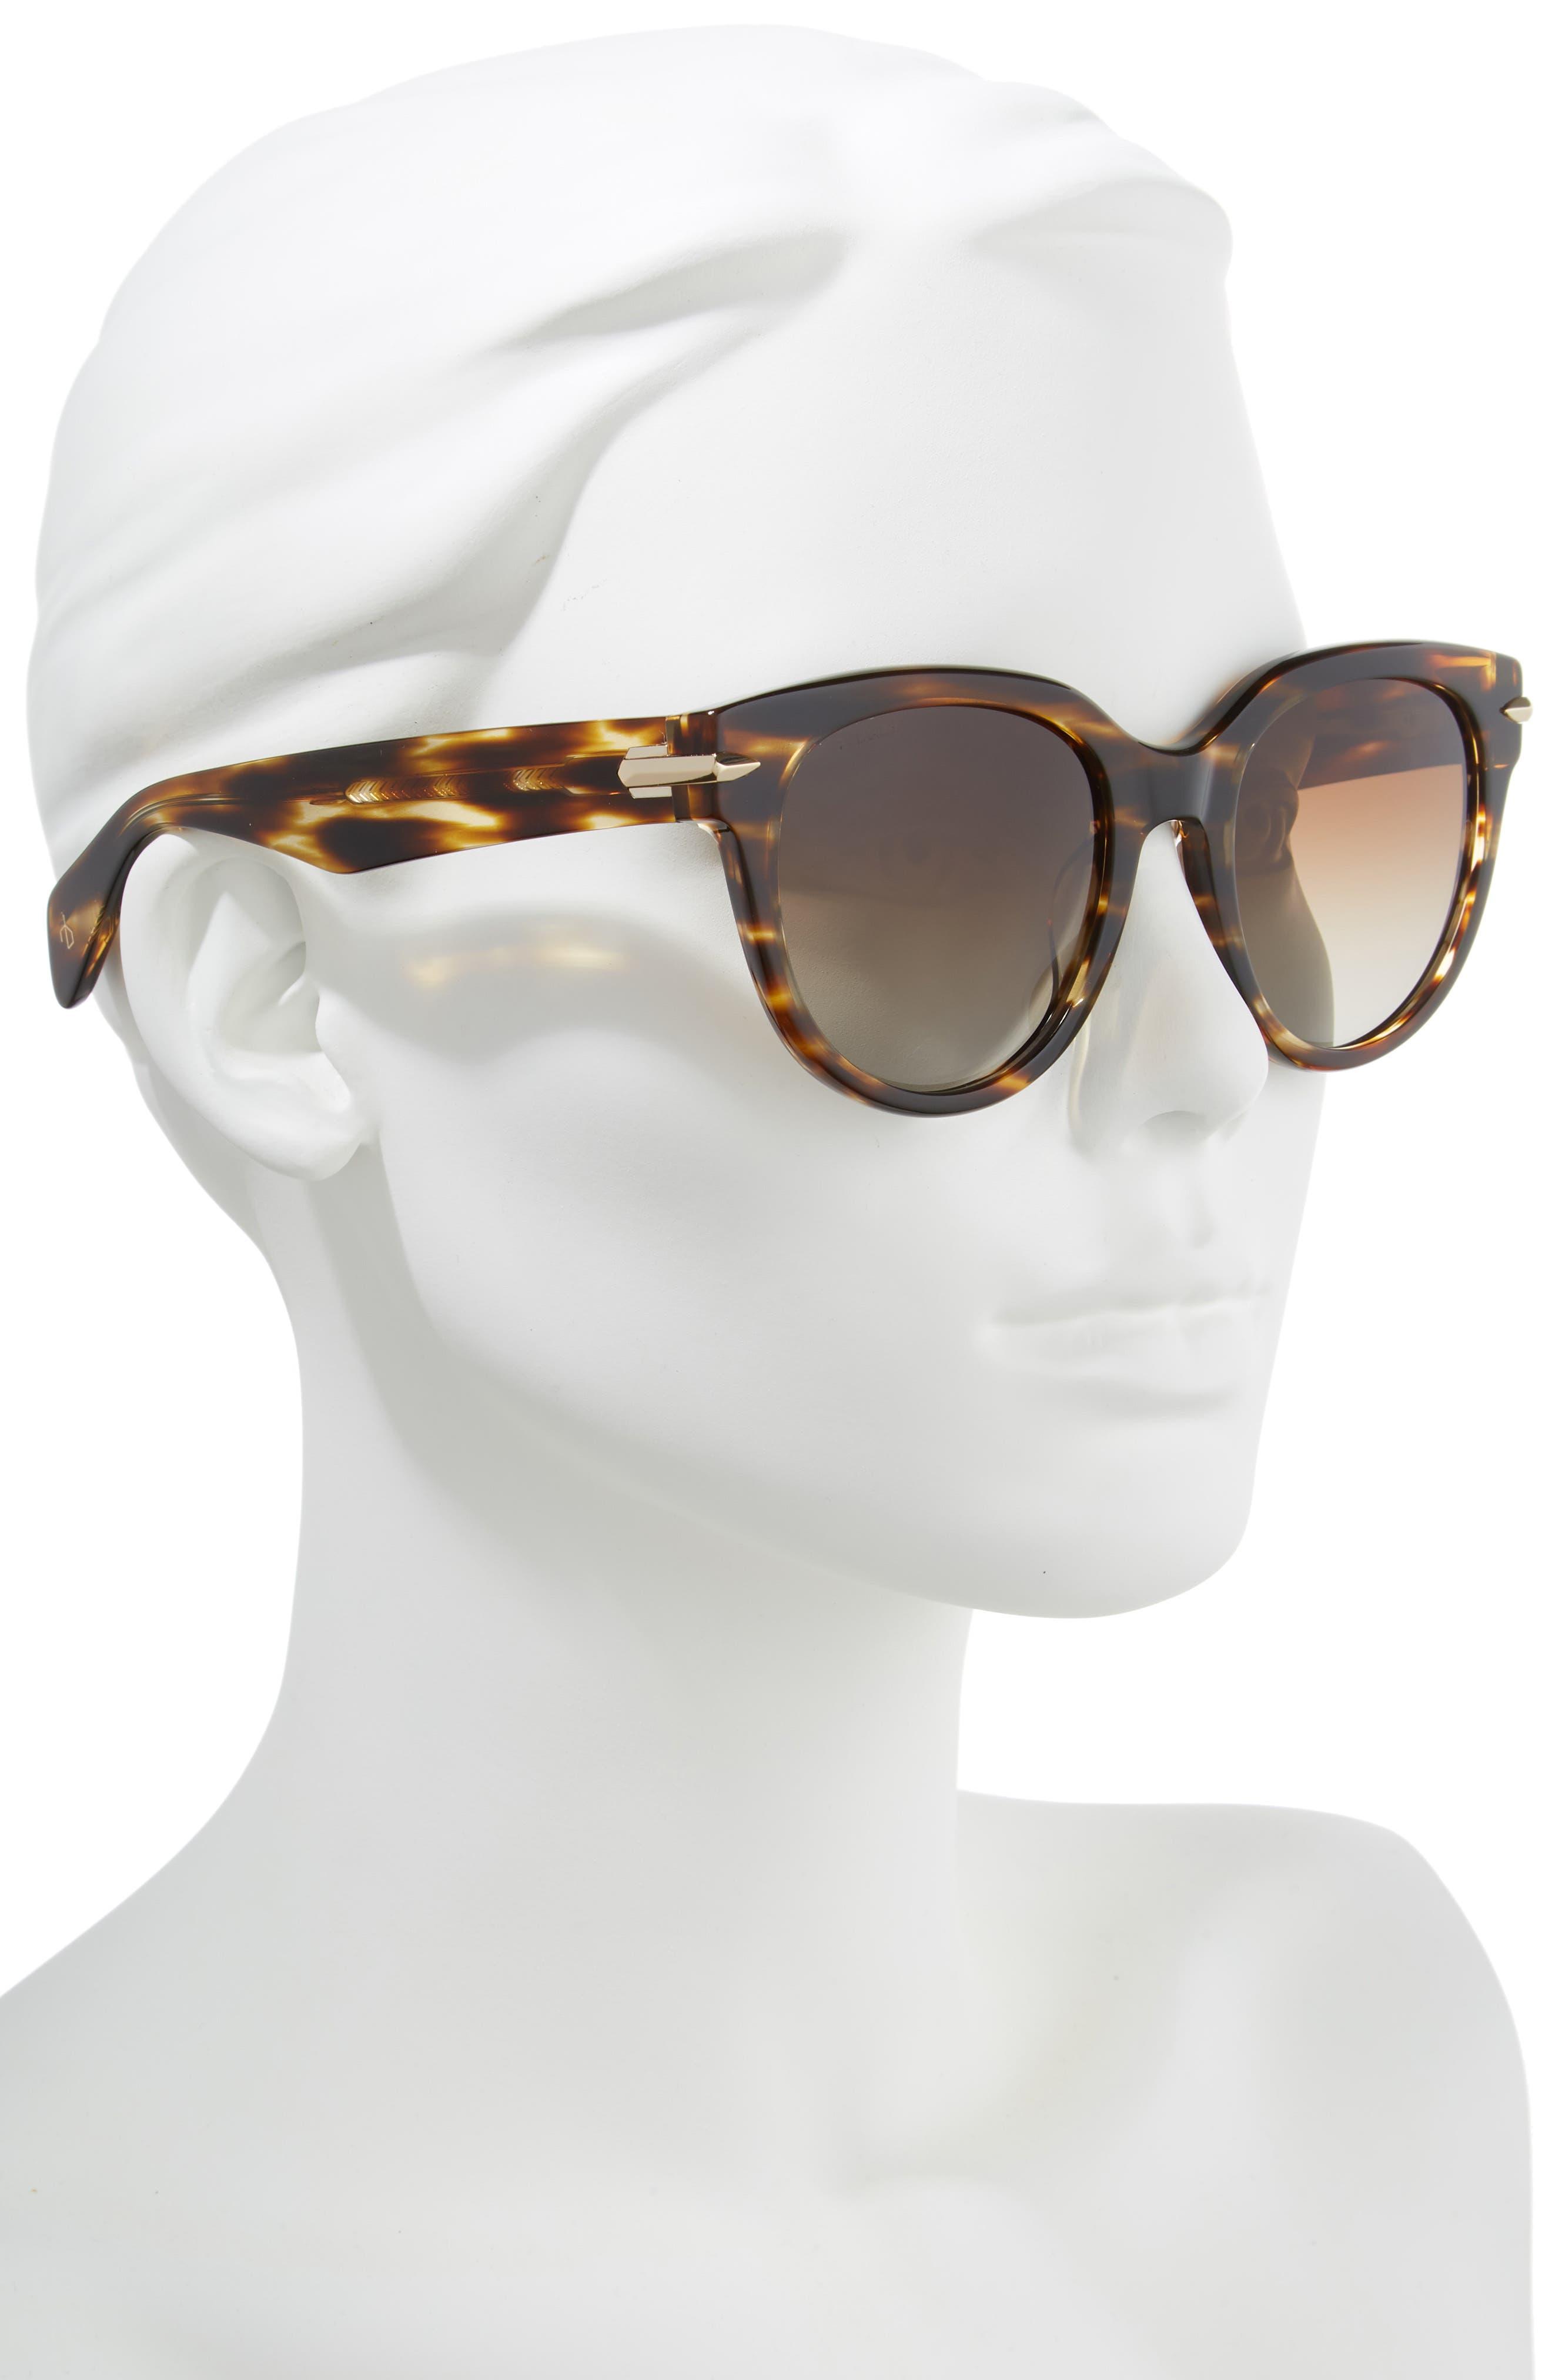 54mm Round Sunglasses,                             Alternate thumbnail 2, color,                             DARK HAVANA